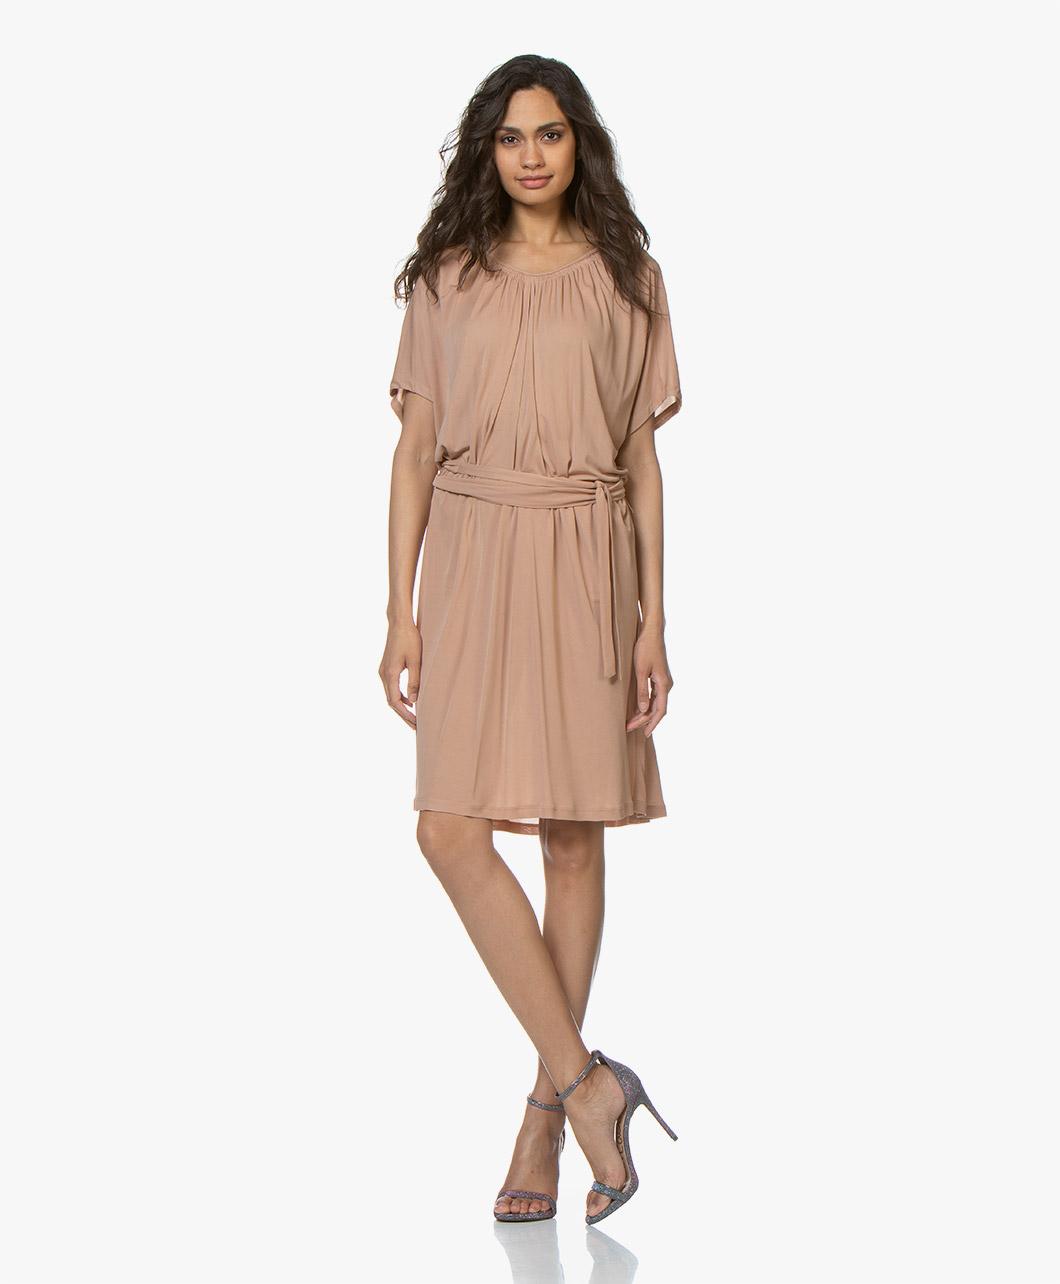 9dd00e3c241 Vanessa Bruno Dress - Nude Loubna Crepe Jersey - loubna | 9evb08-v08021 402